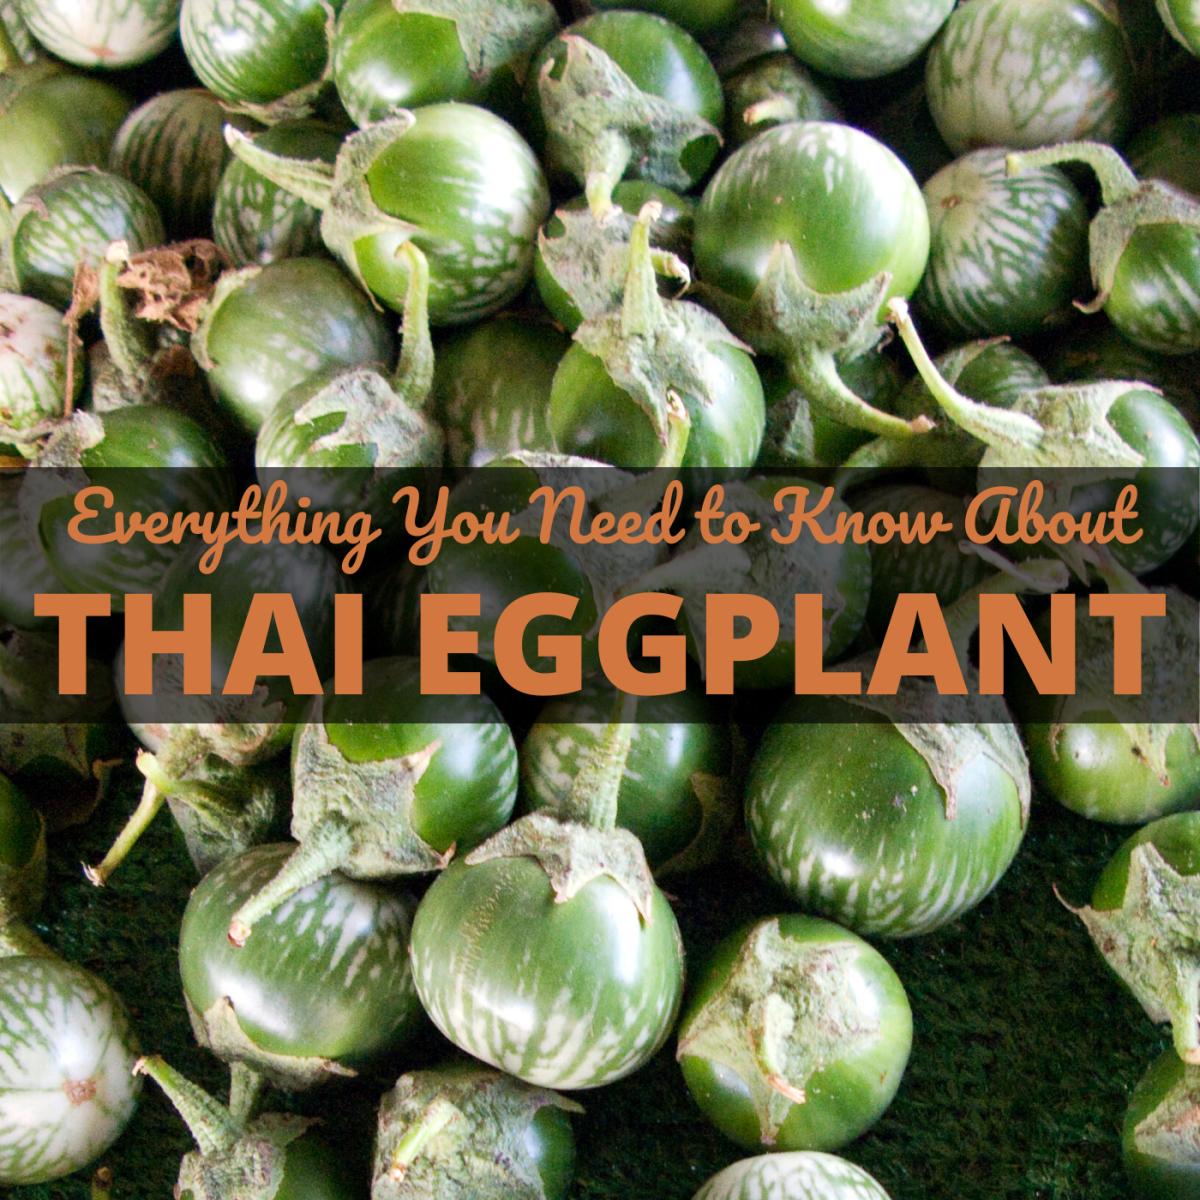 Thai Eggplant: A Popular Thai Food Ingredient